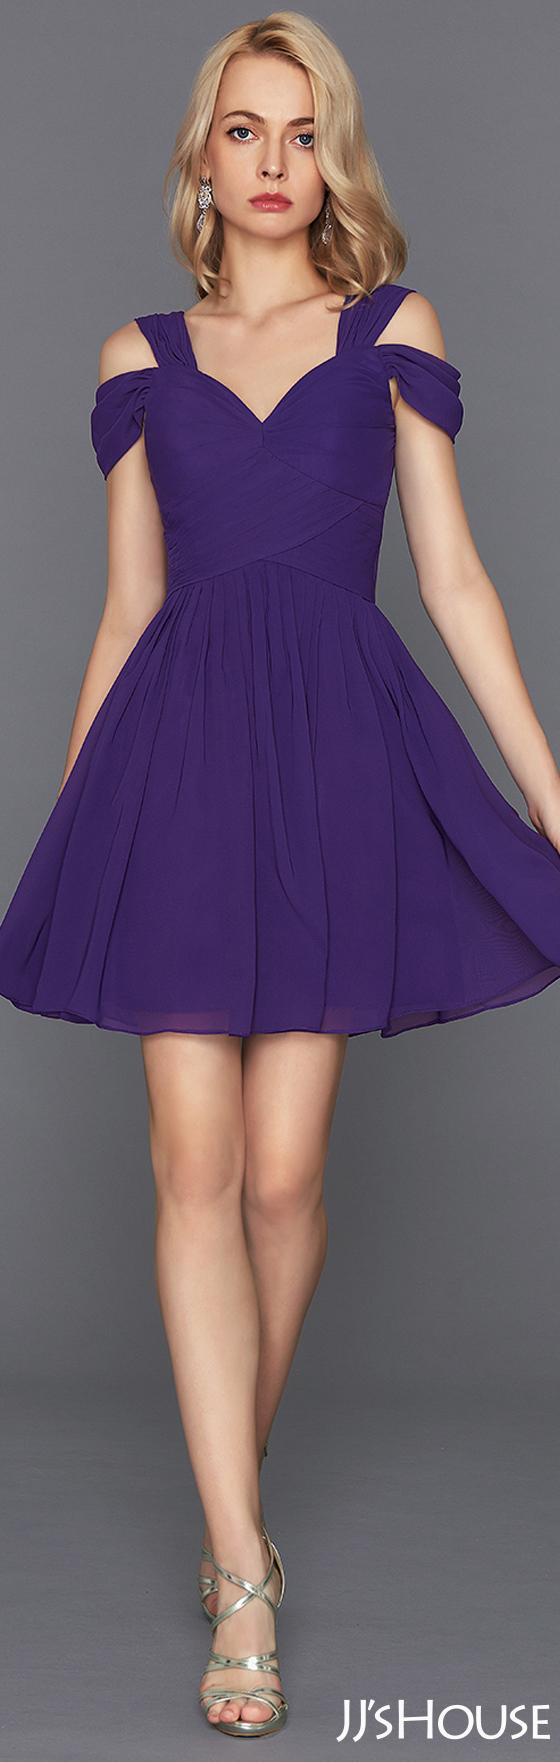 A-Line/Princess Sweetheart Short/Mini Chiffon Cocktail Dress With ...